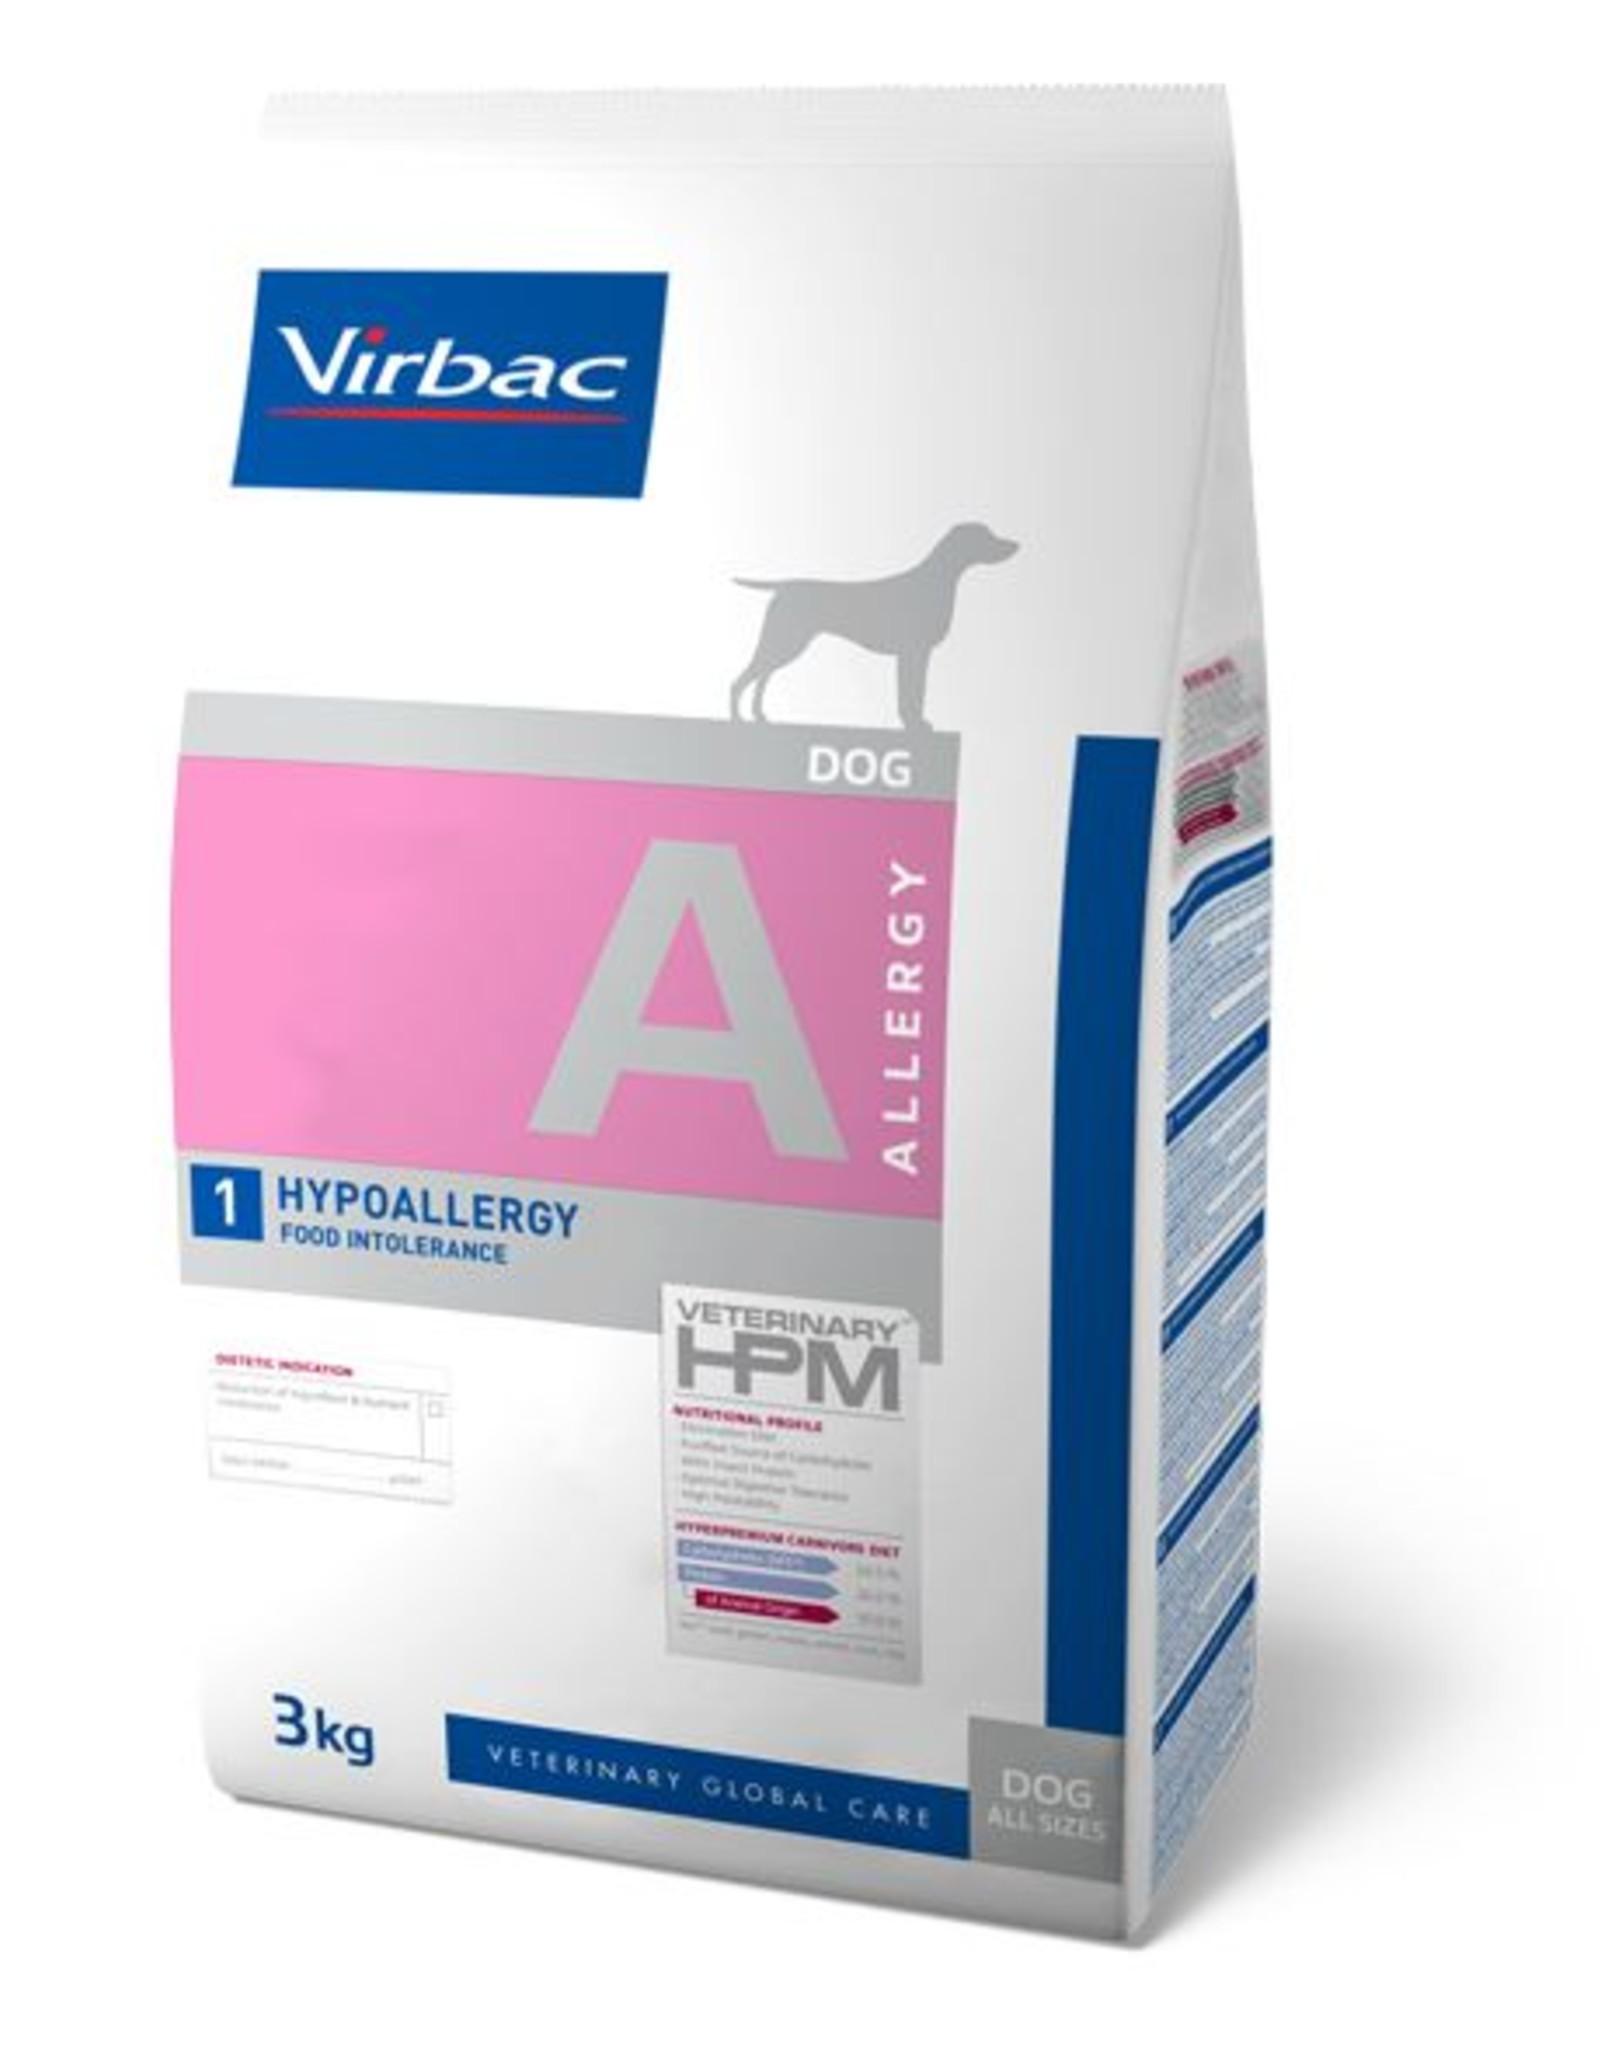 Virbac Virbac Hpm Hond Hypoallergy A1 3kg